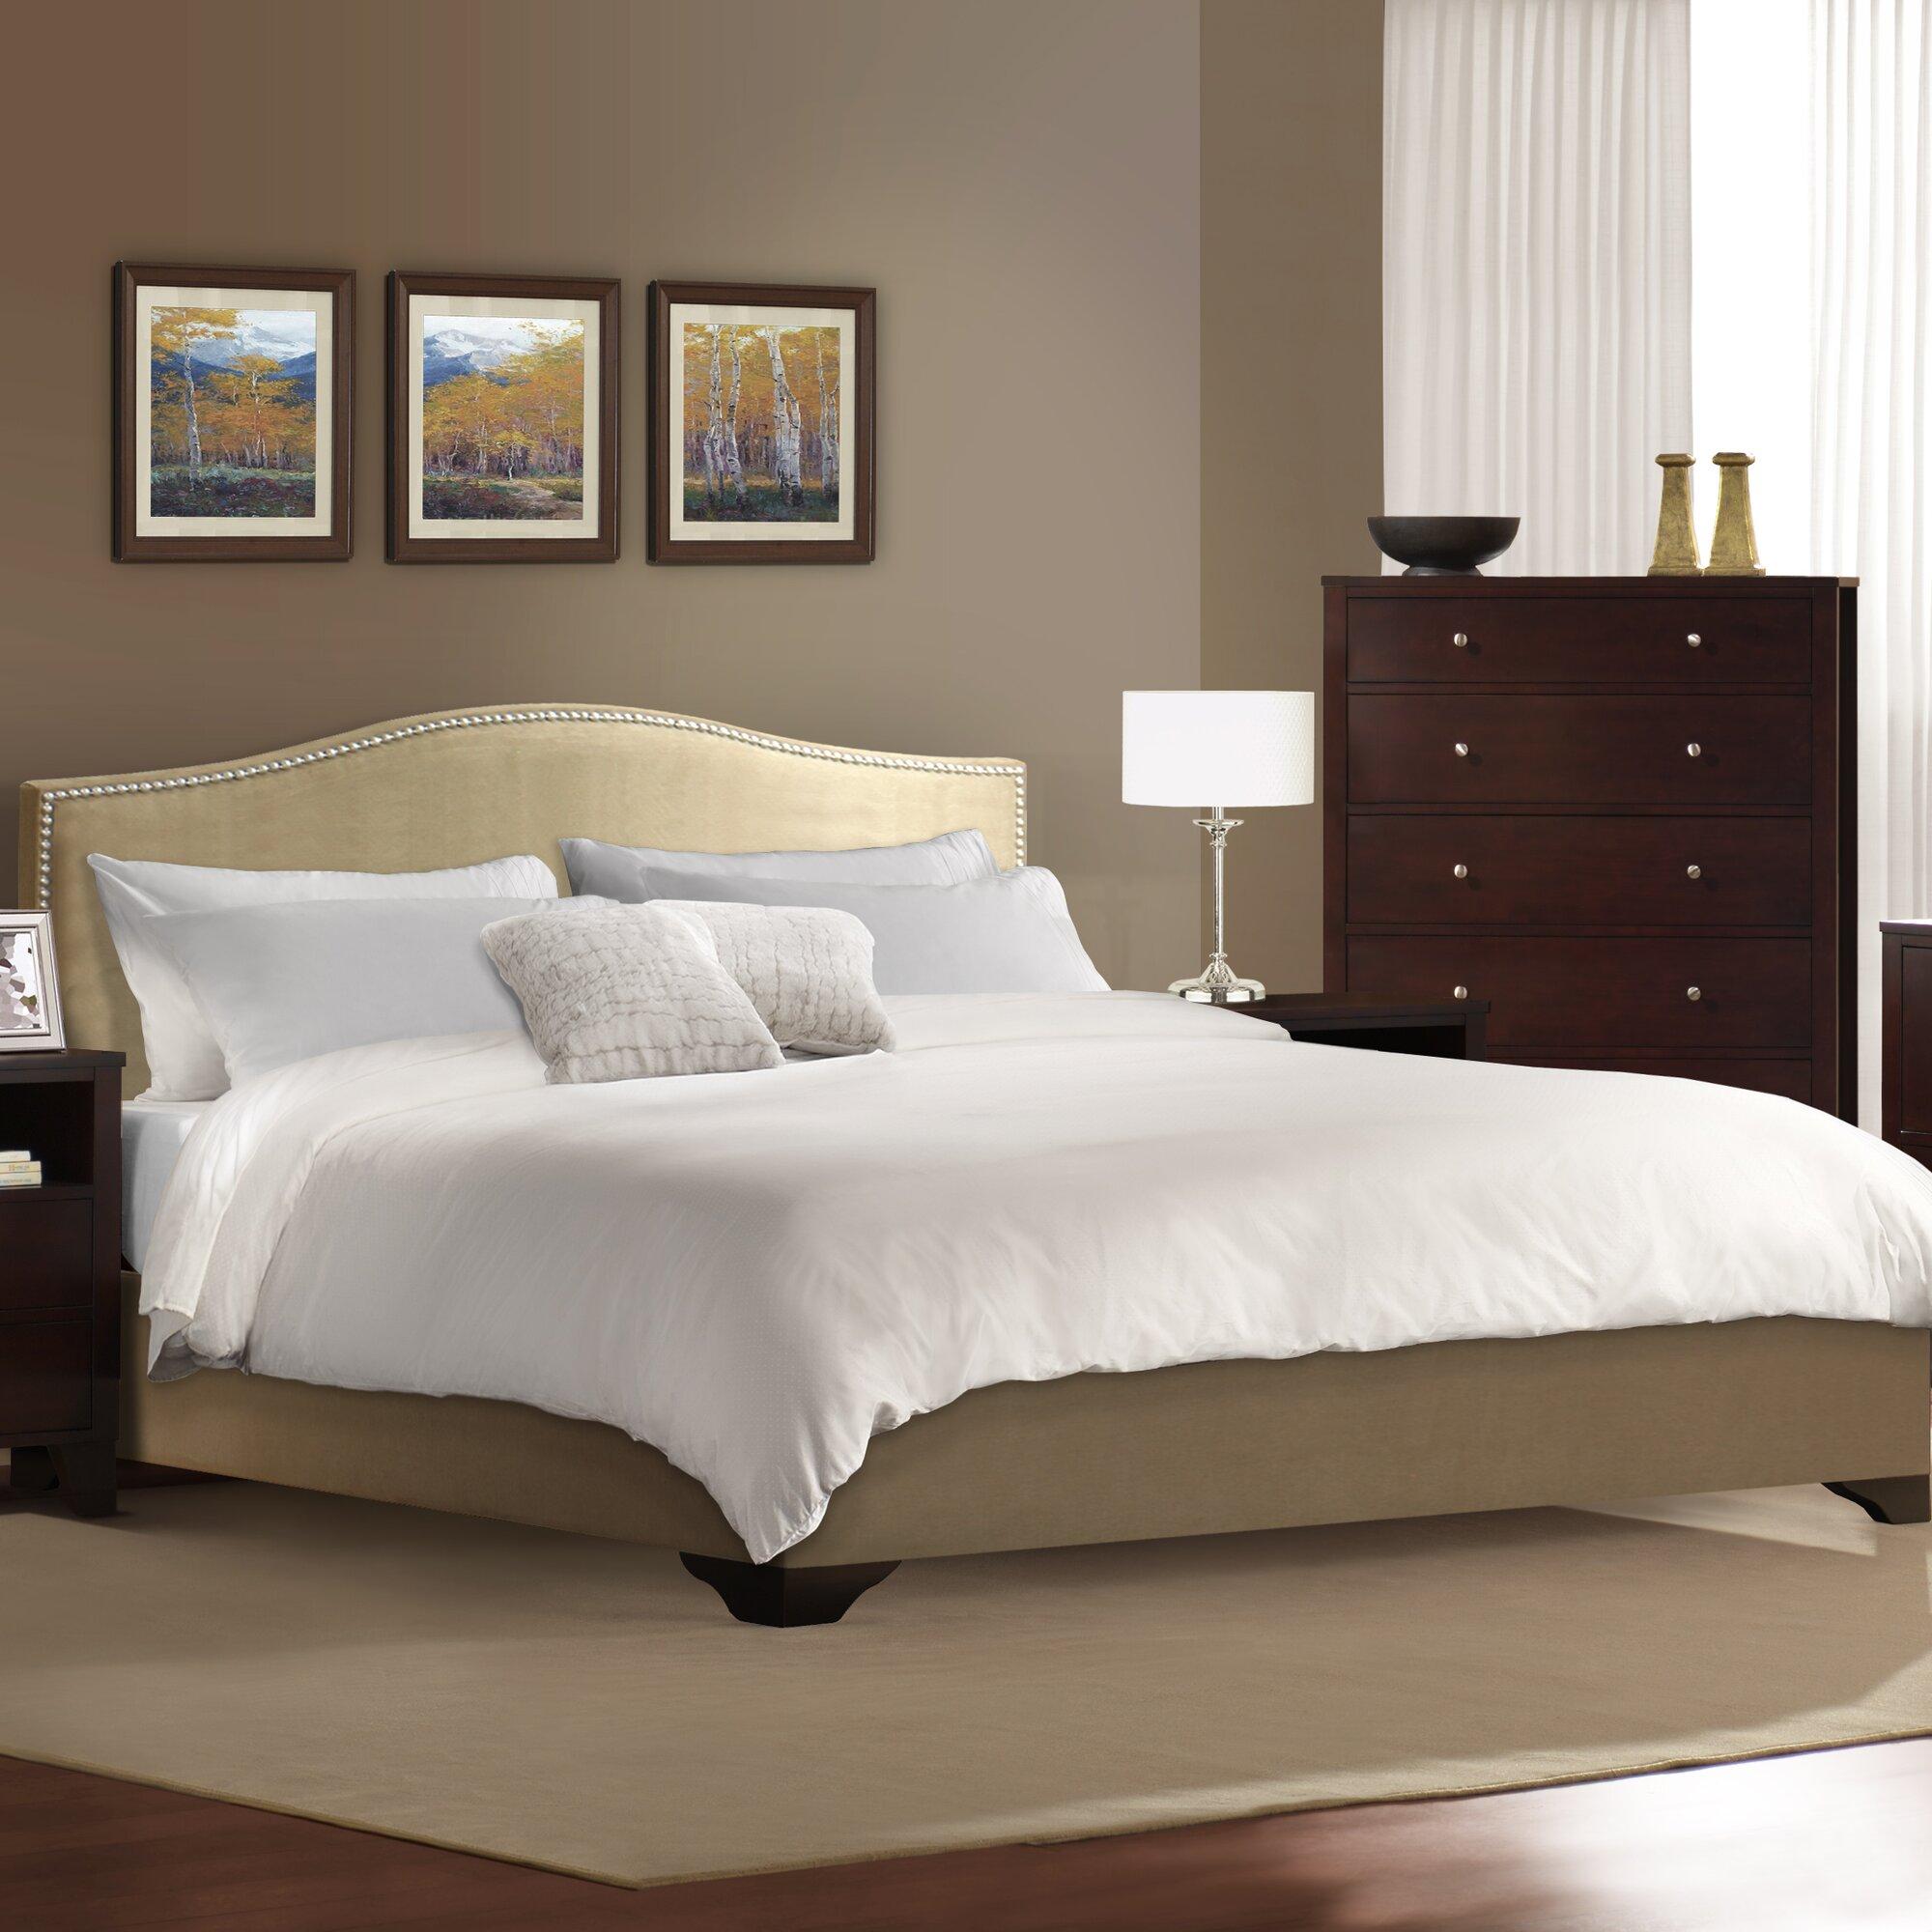 LifeStyle Solutions Magnolia Platform 4 Piece Bedroom Set ...